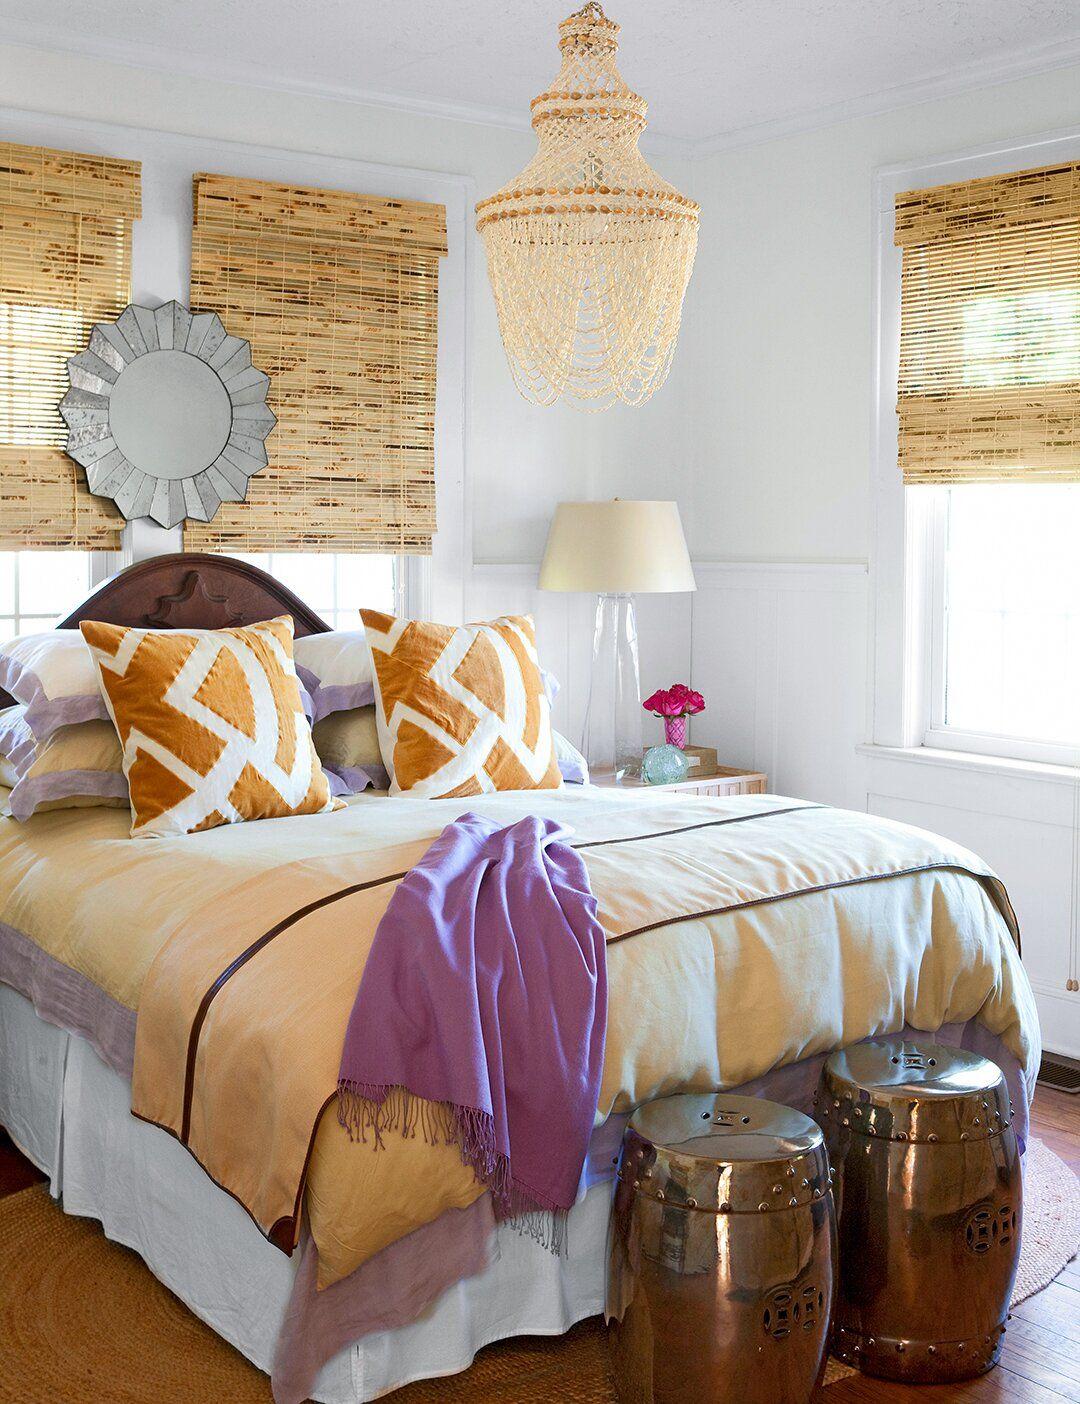 No-Fail Tricks for Arranging Furniture in 2020 | Arranging ...